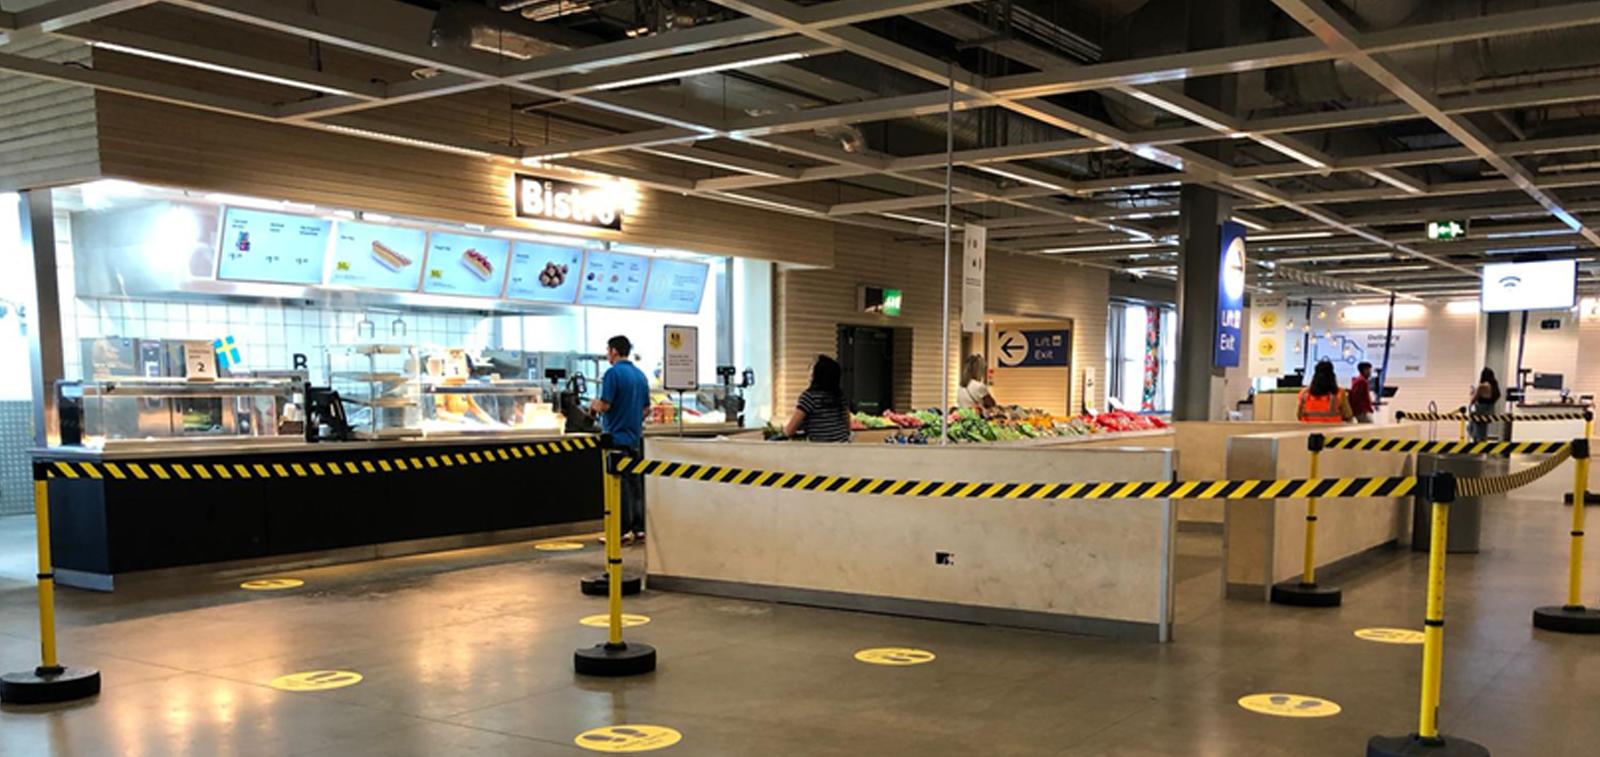 image of barrier in Ikea